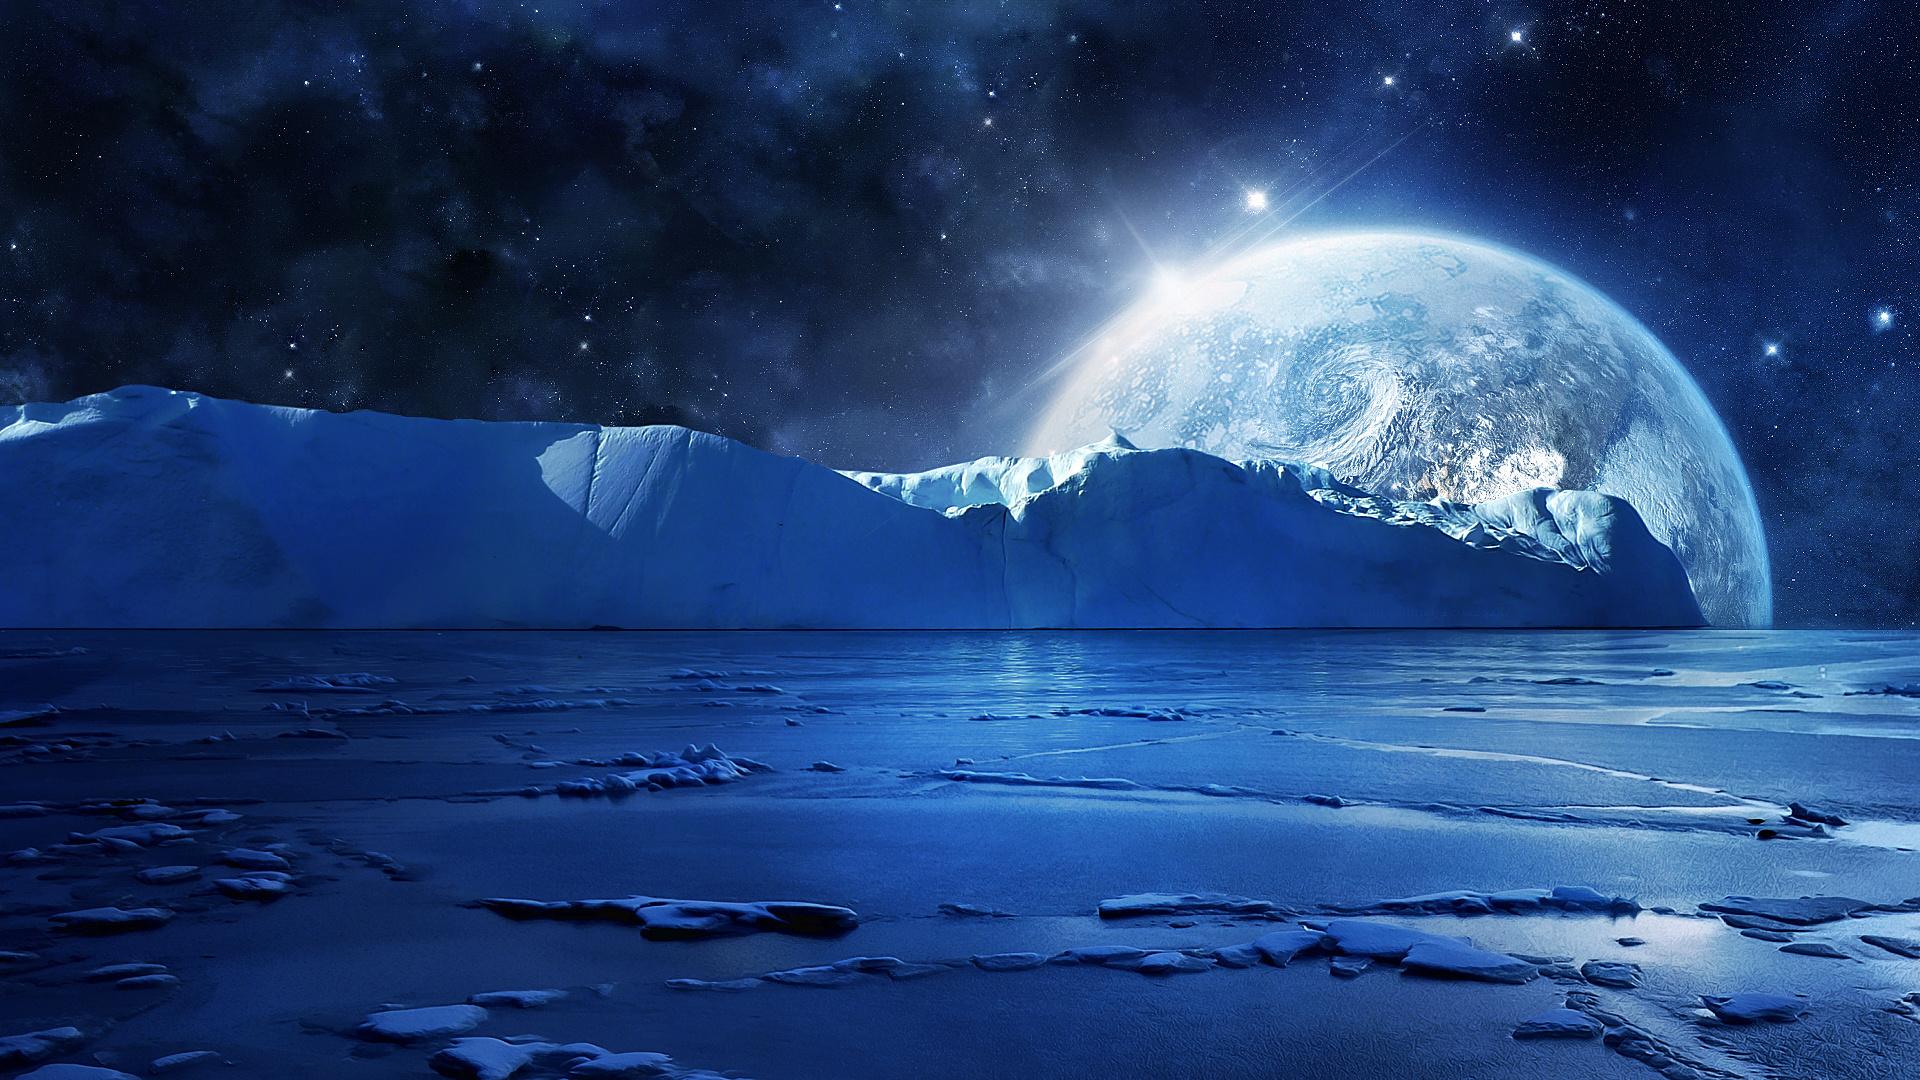 winter night sky planets - photo #14